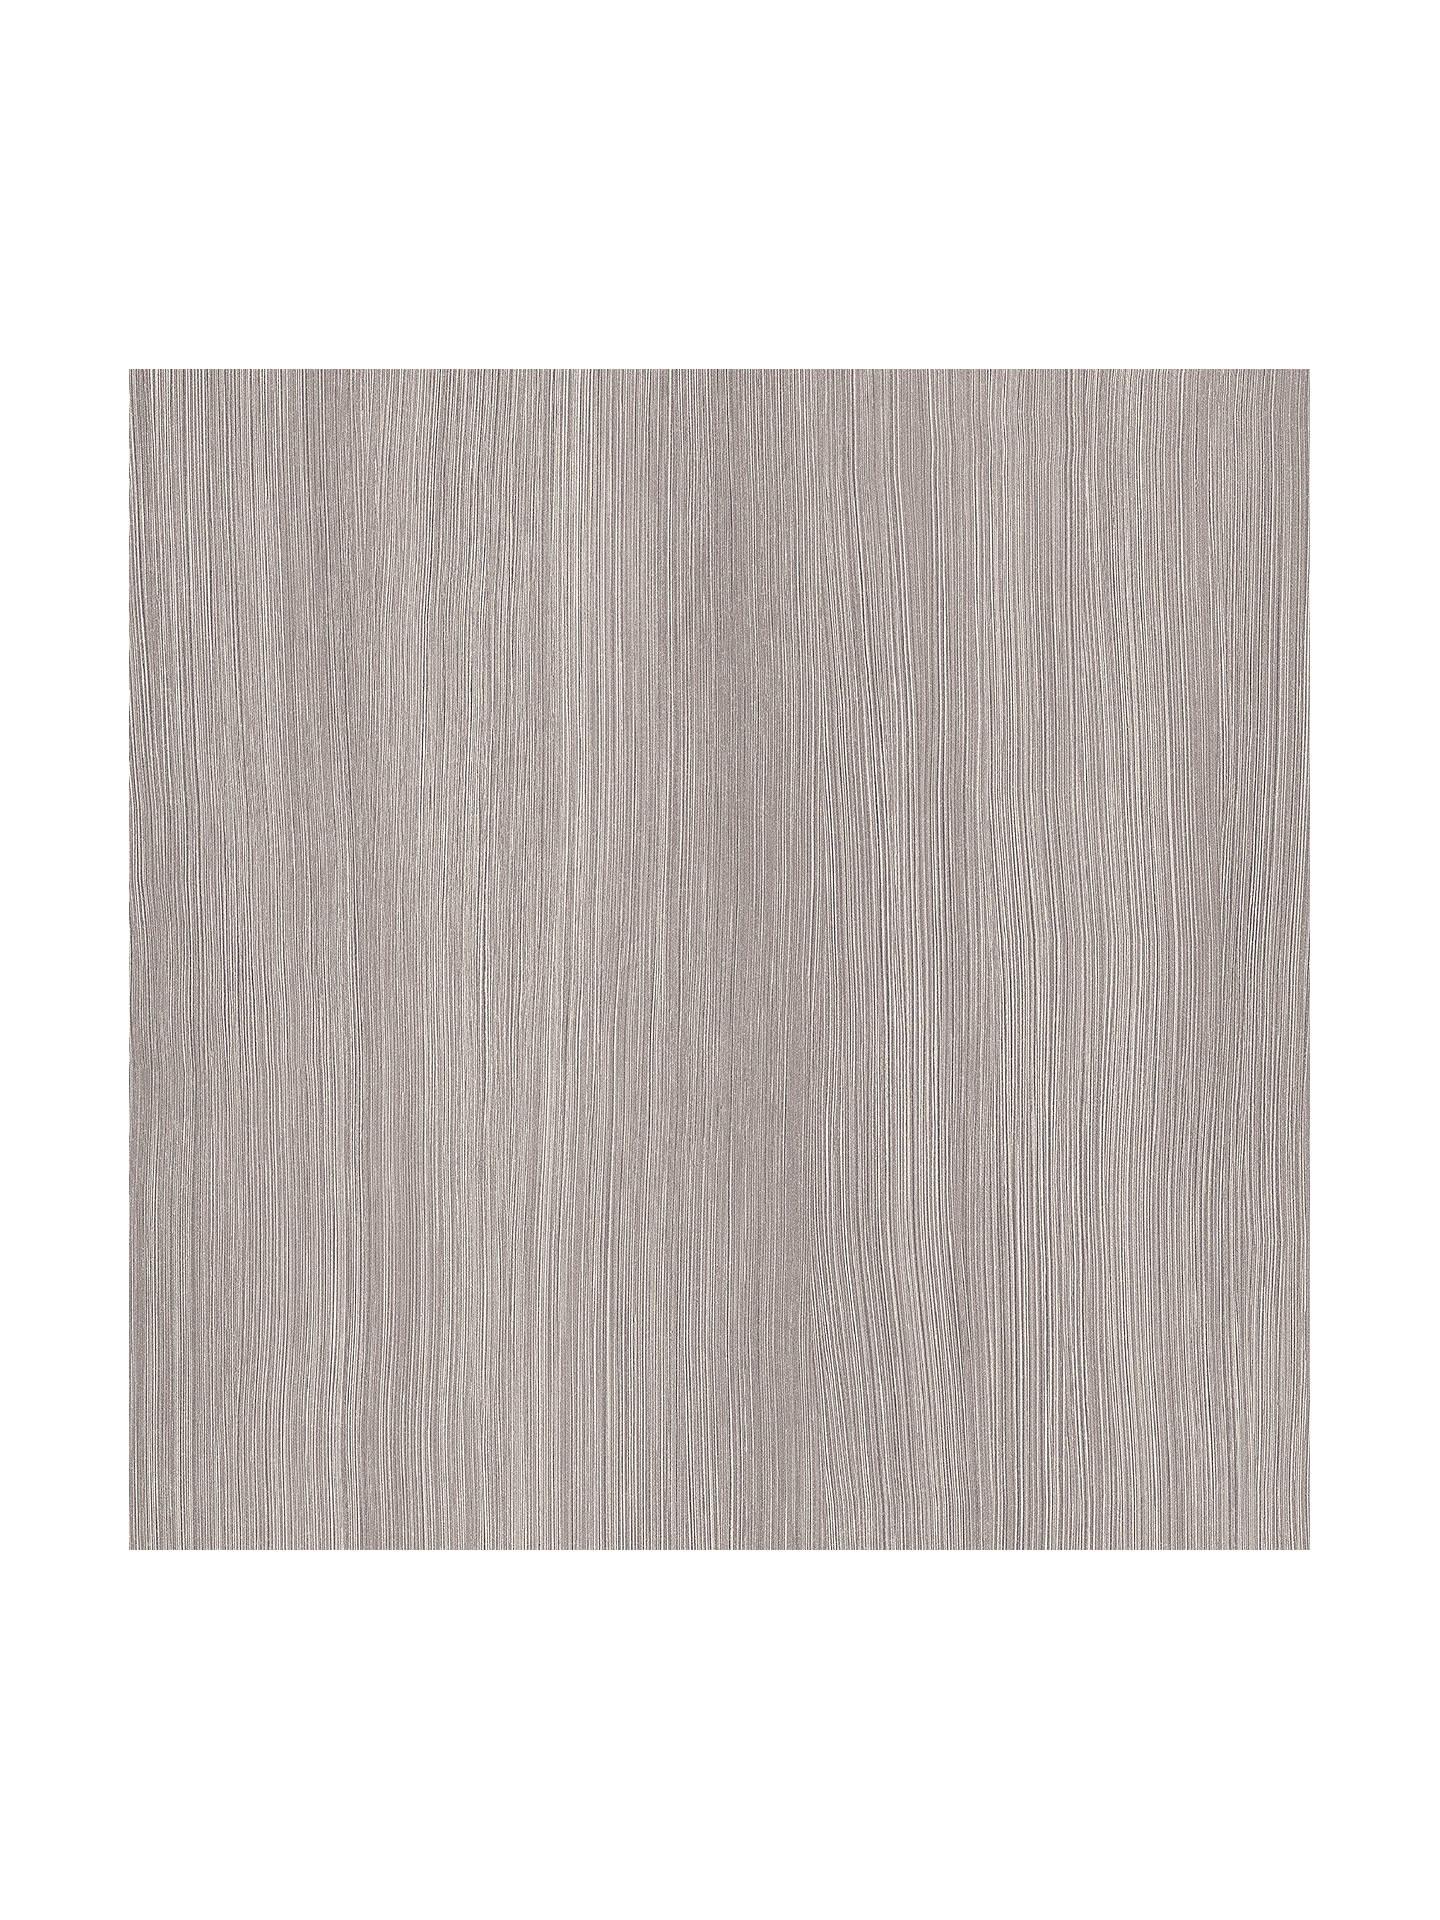 john lewis partners smooth ultimate vinyl flooring at john lewis partners. Black Bedroom Furniture Sets. Home Design Ideas